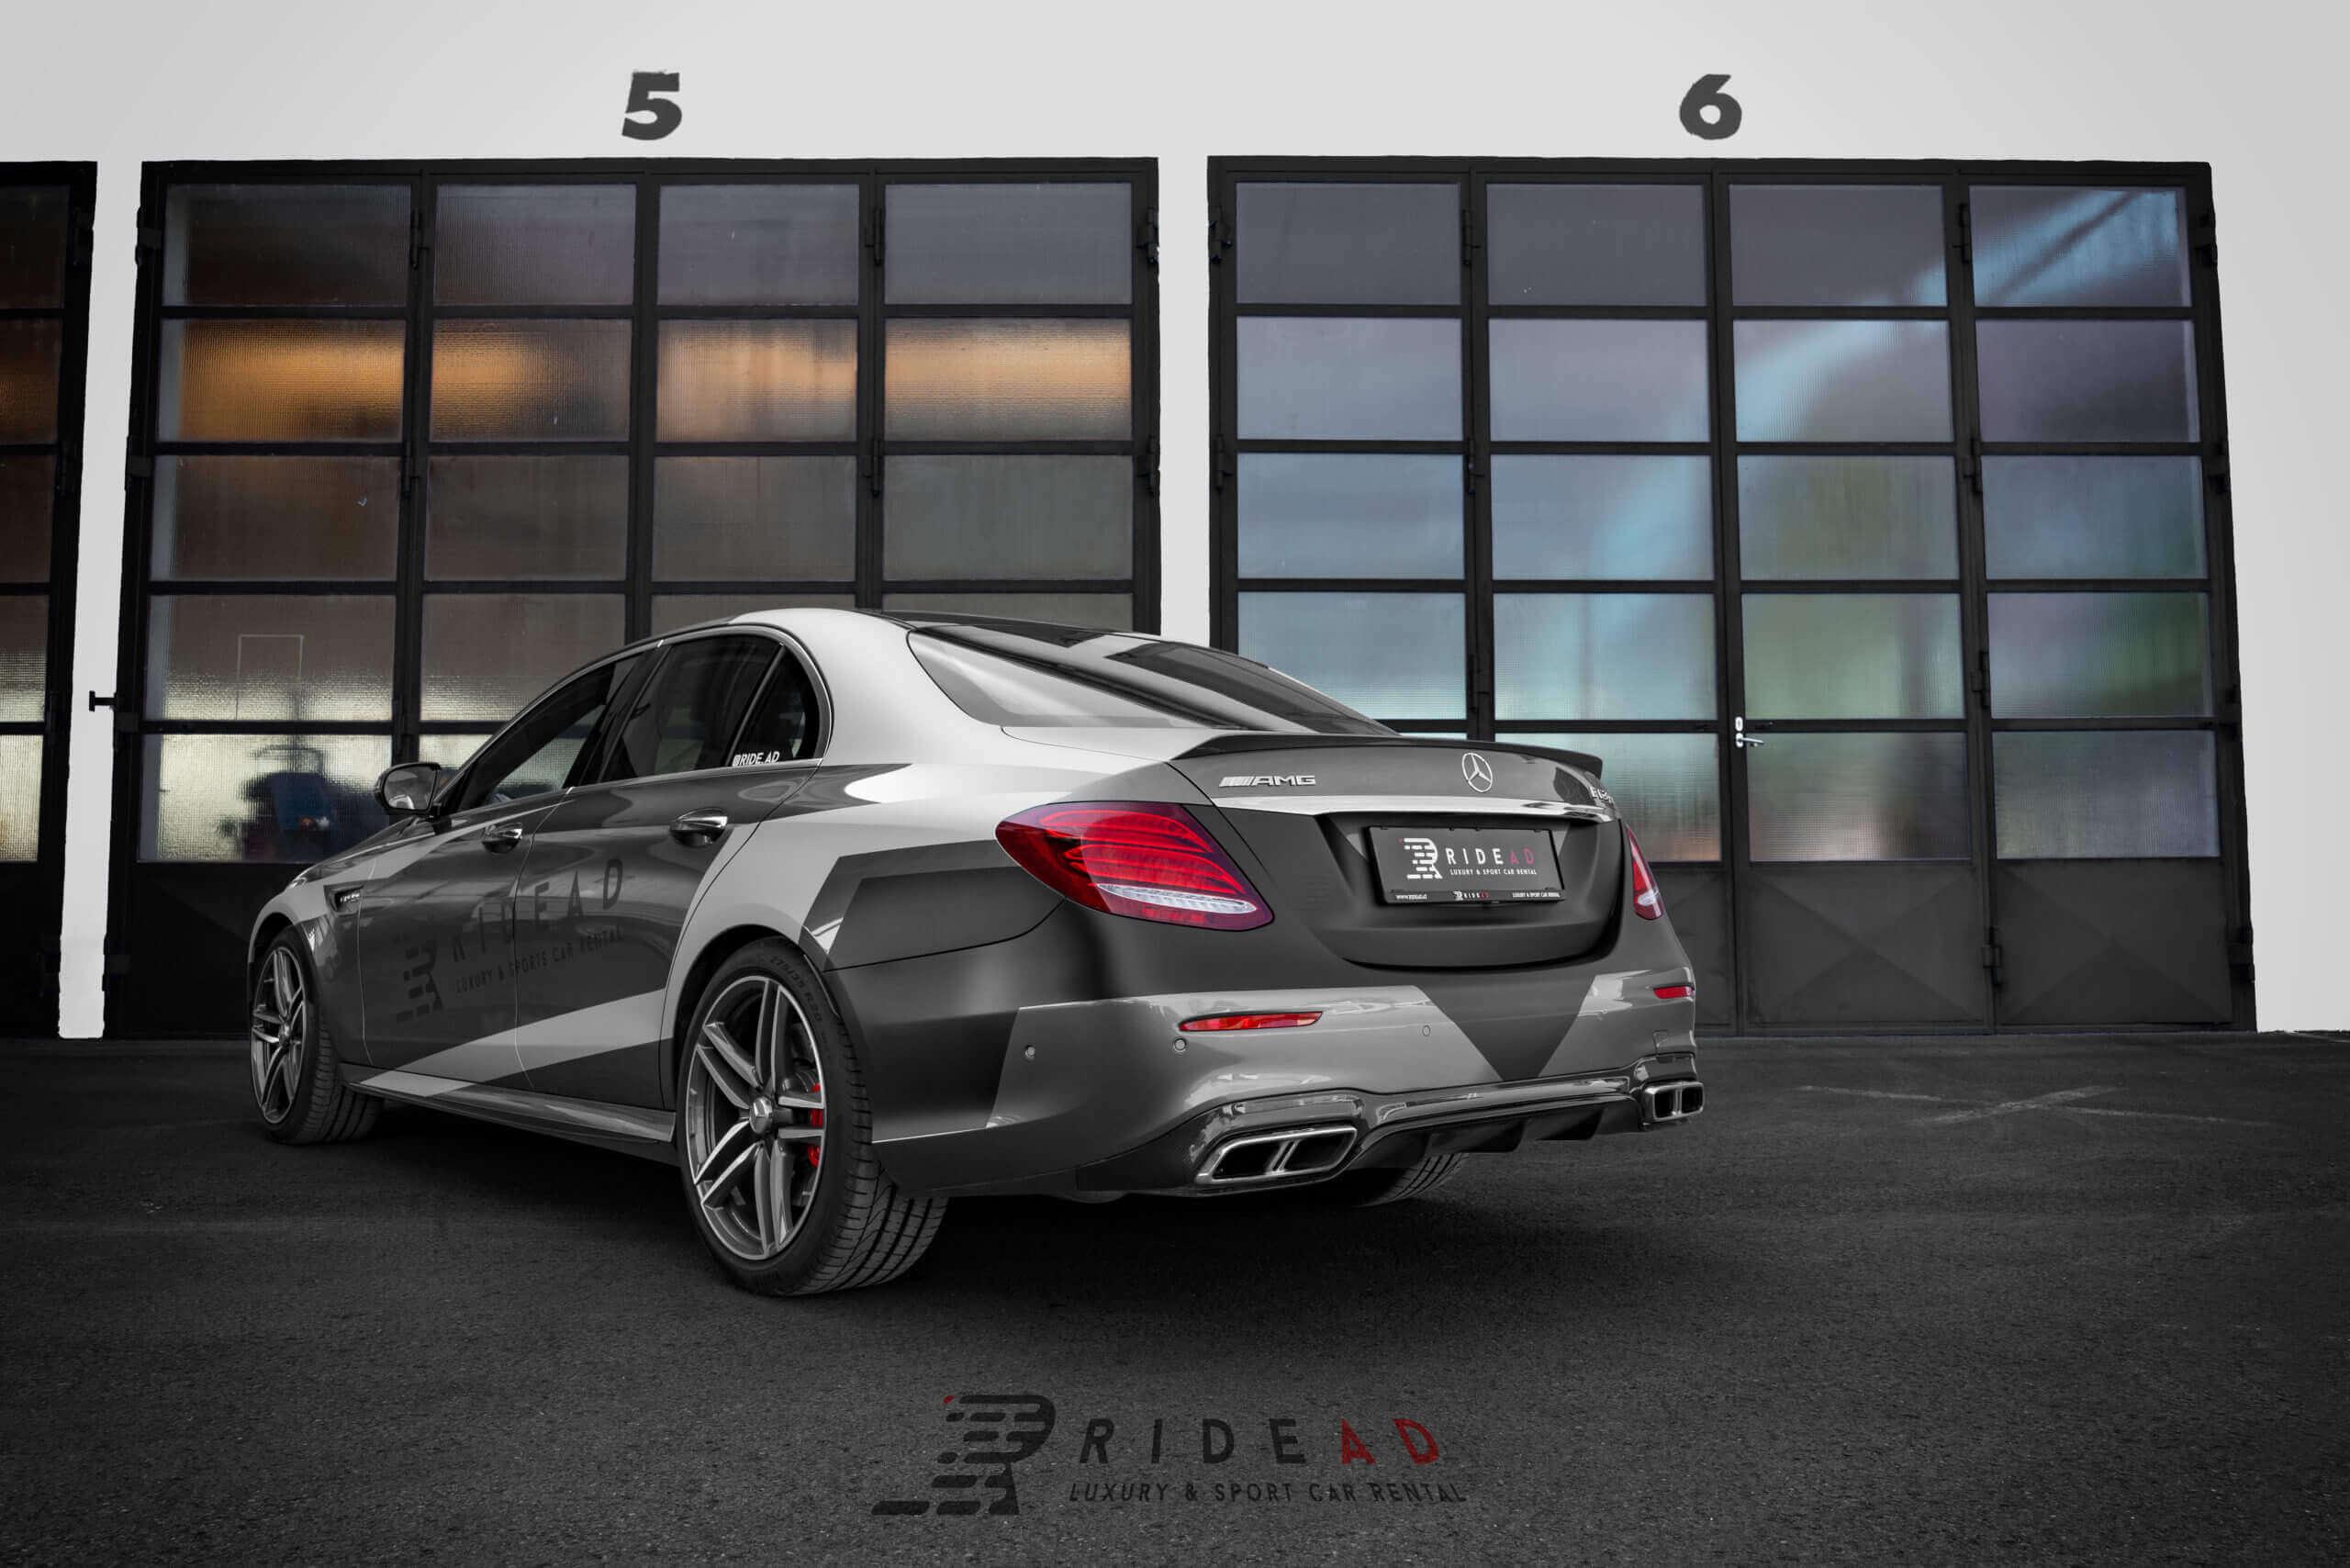 Ride Ad Luxury and Sports Car Rental - Mercedes-Benz E63 s AMG Kurzzeitmiete 2